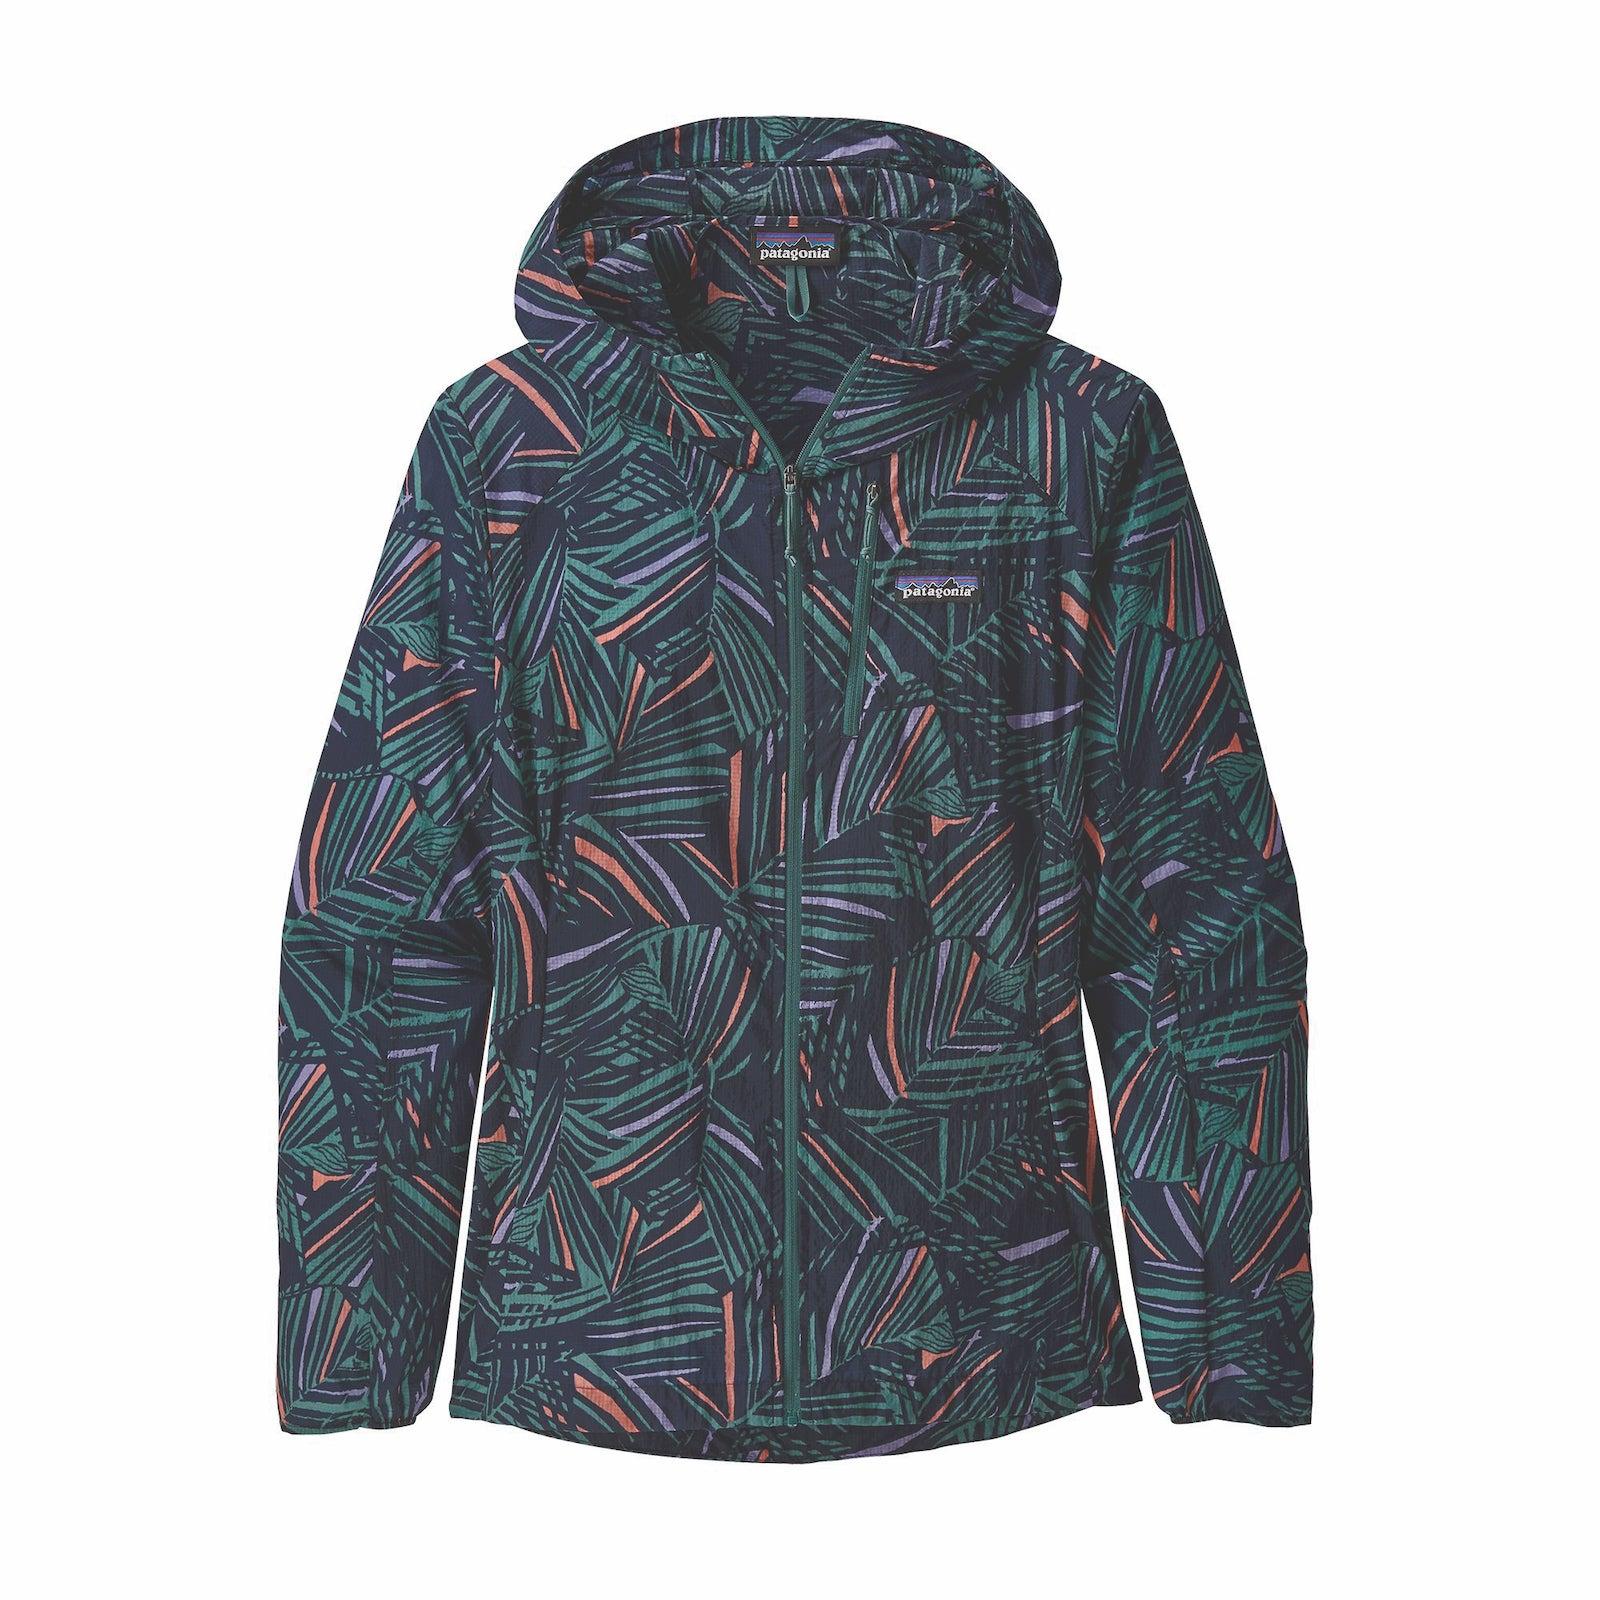 recycled Patagonia jacket